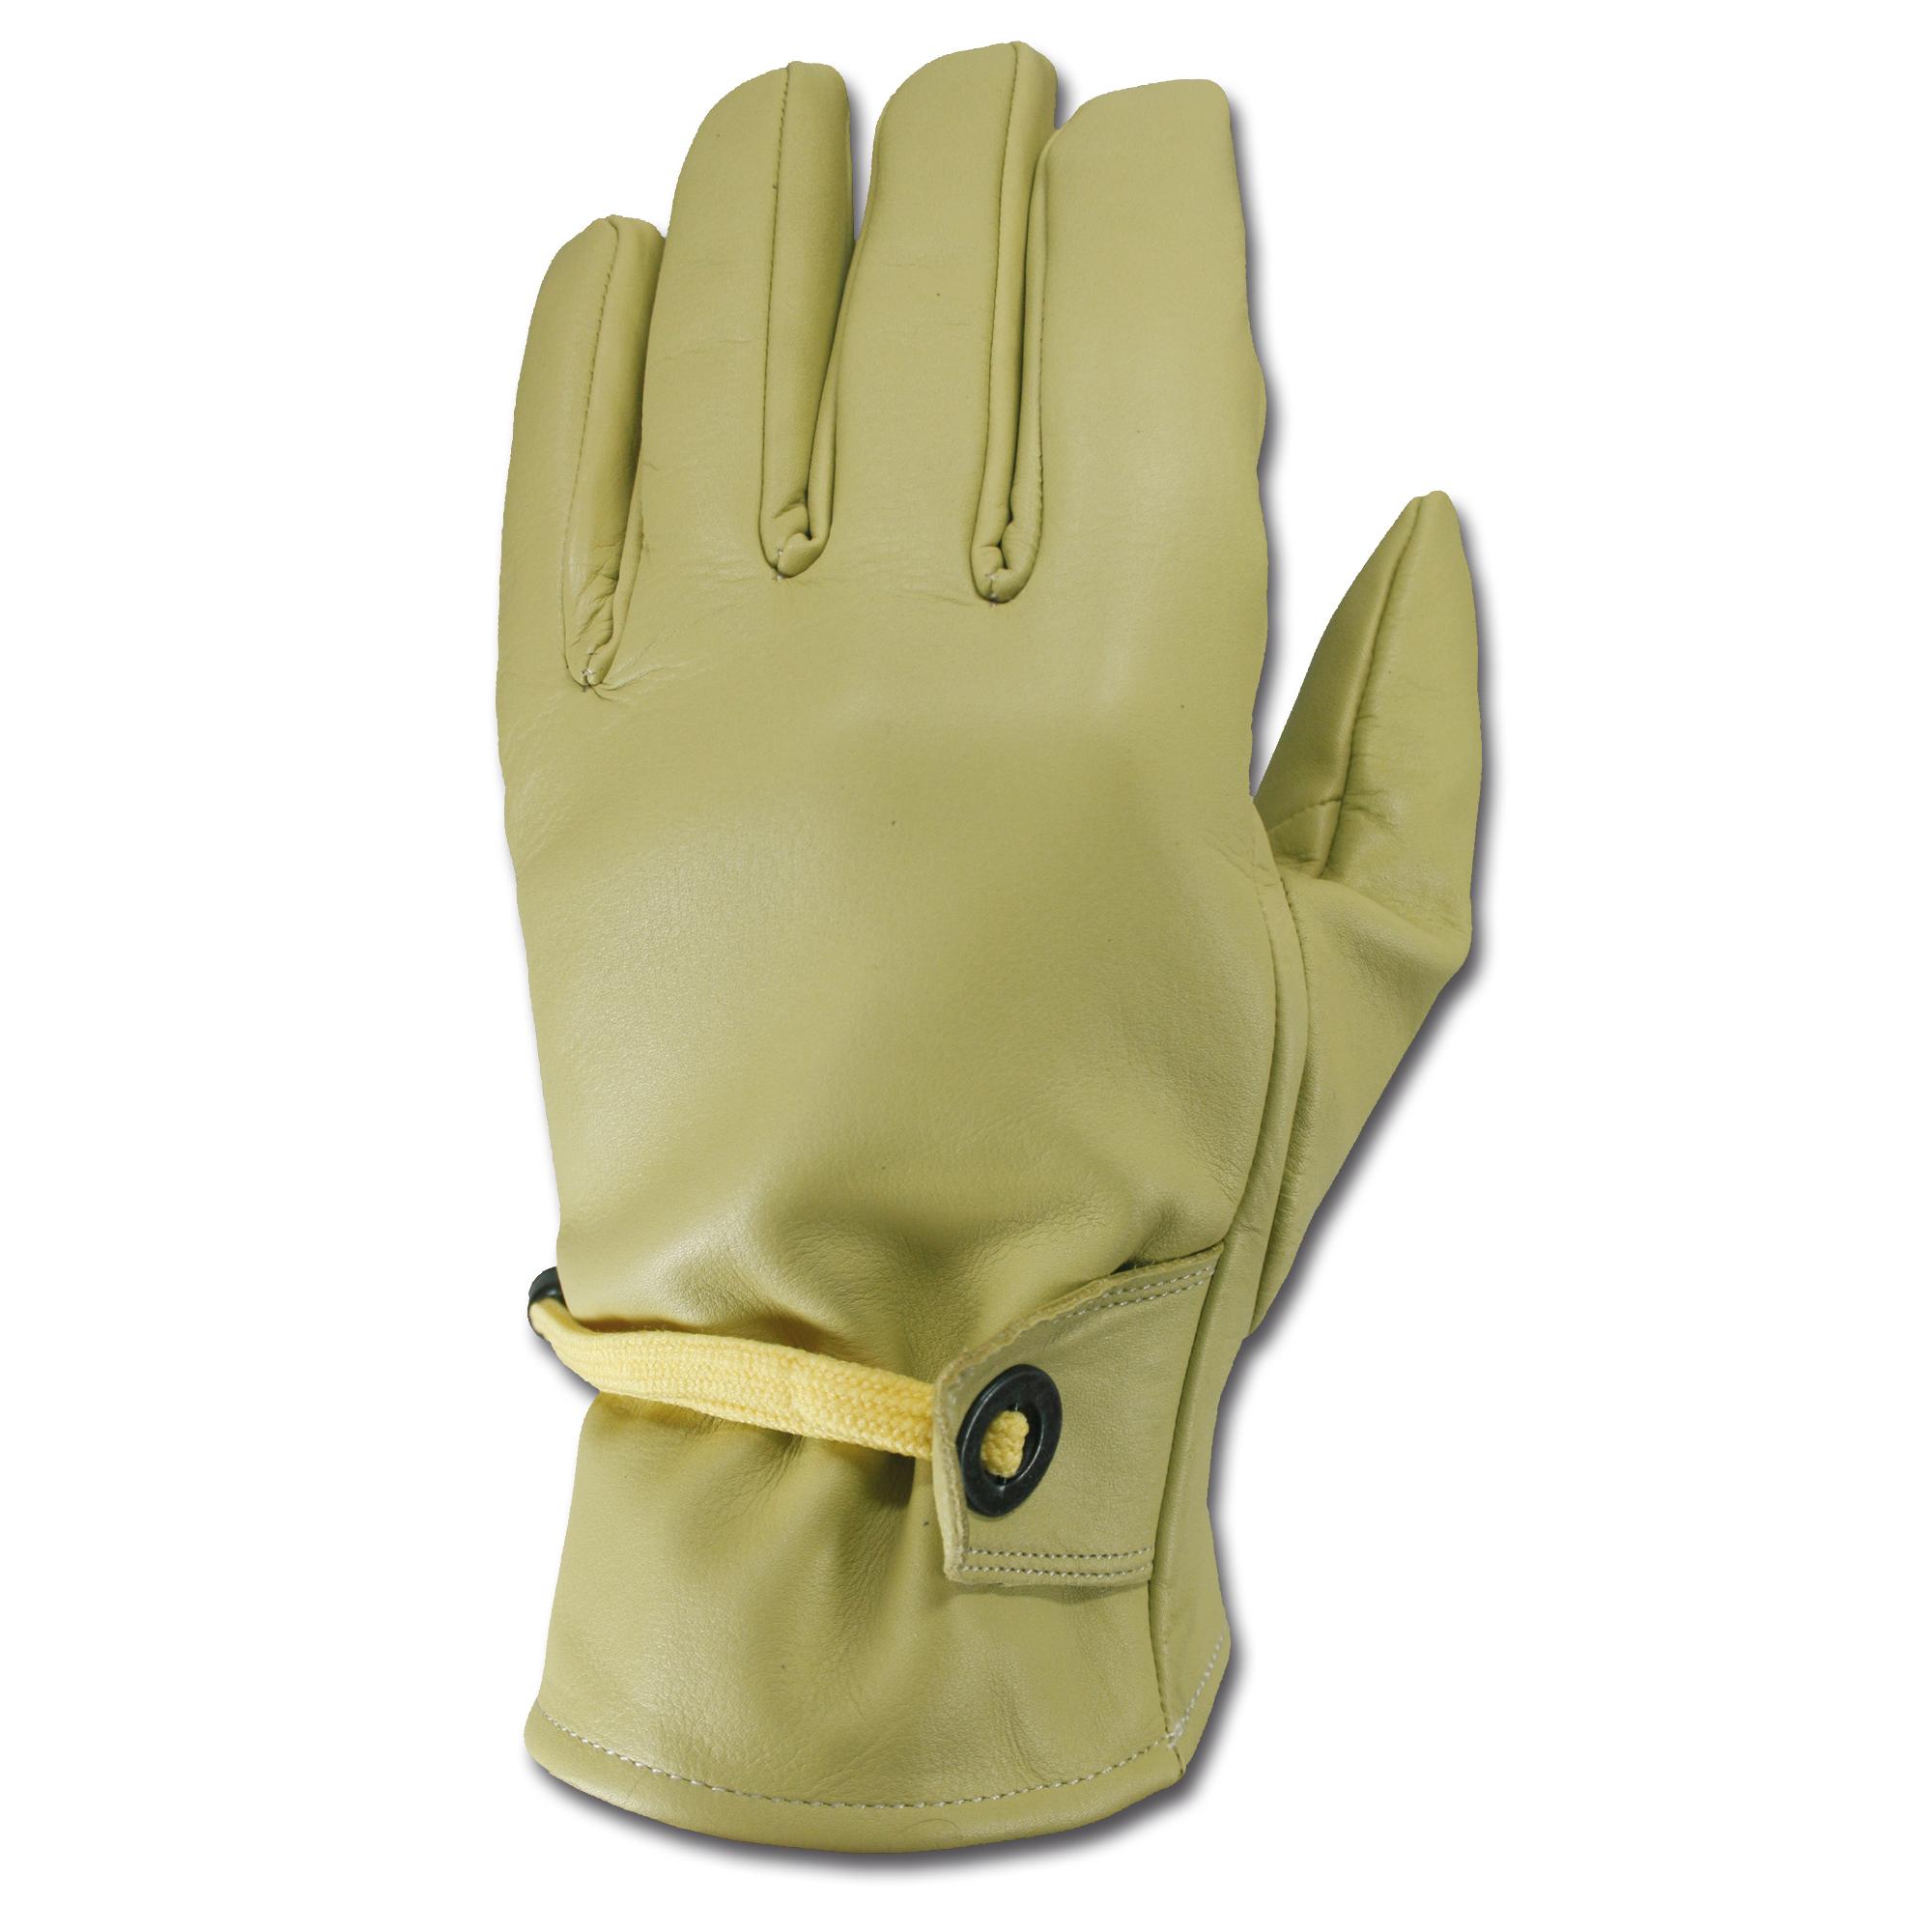 Western Handschuhe beige